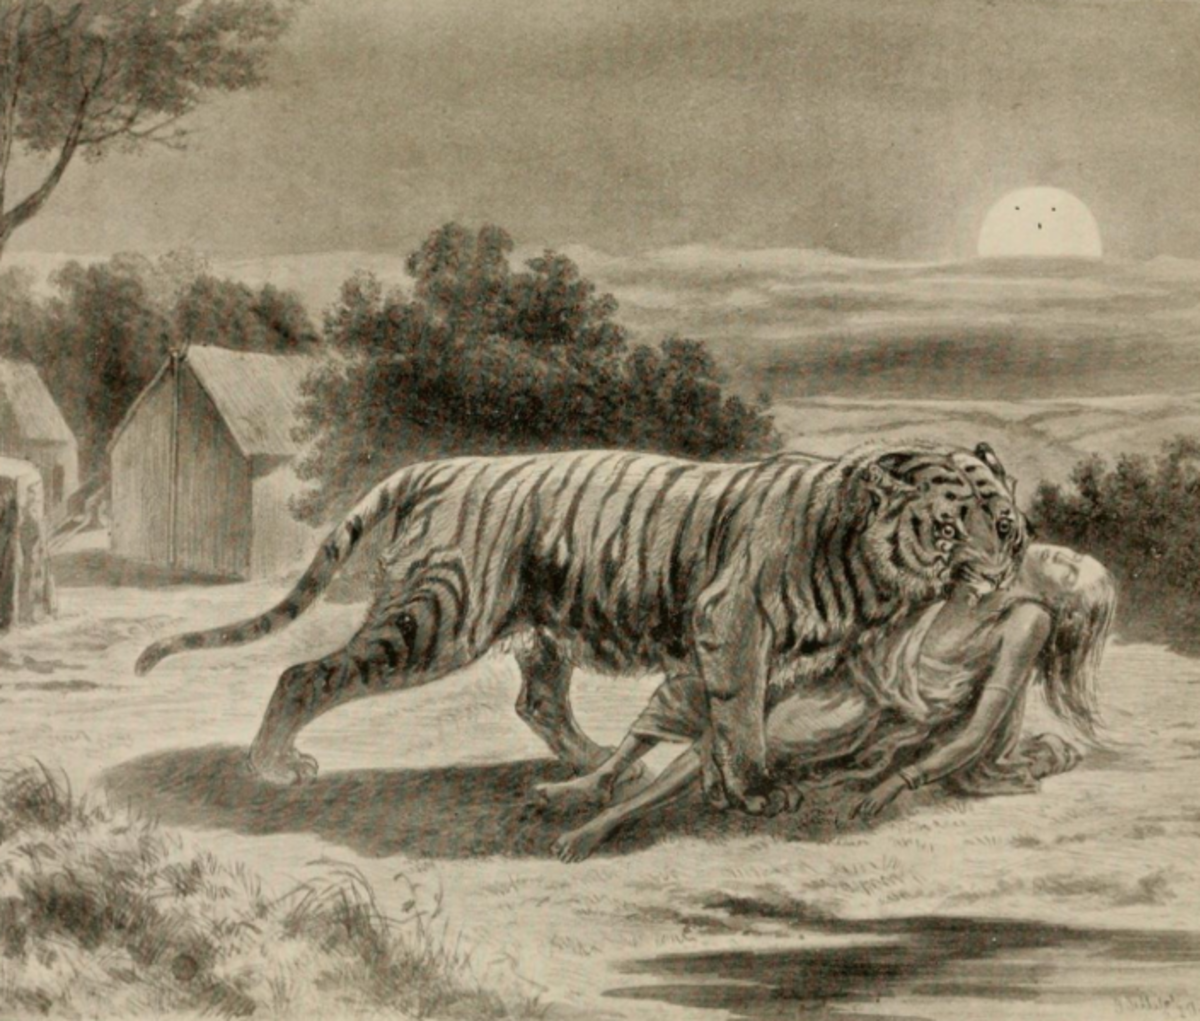 Illustration by George P. Sanderson